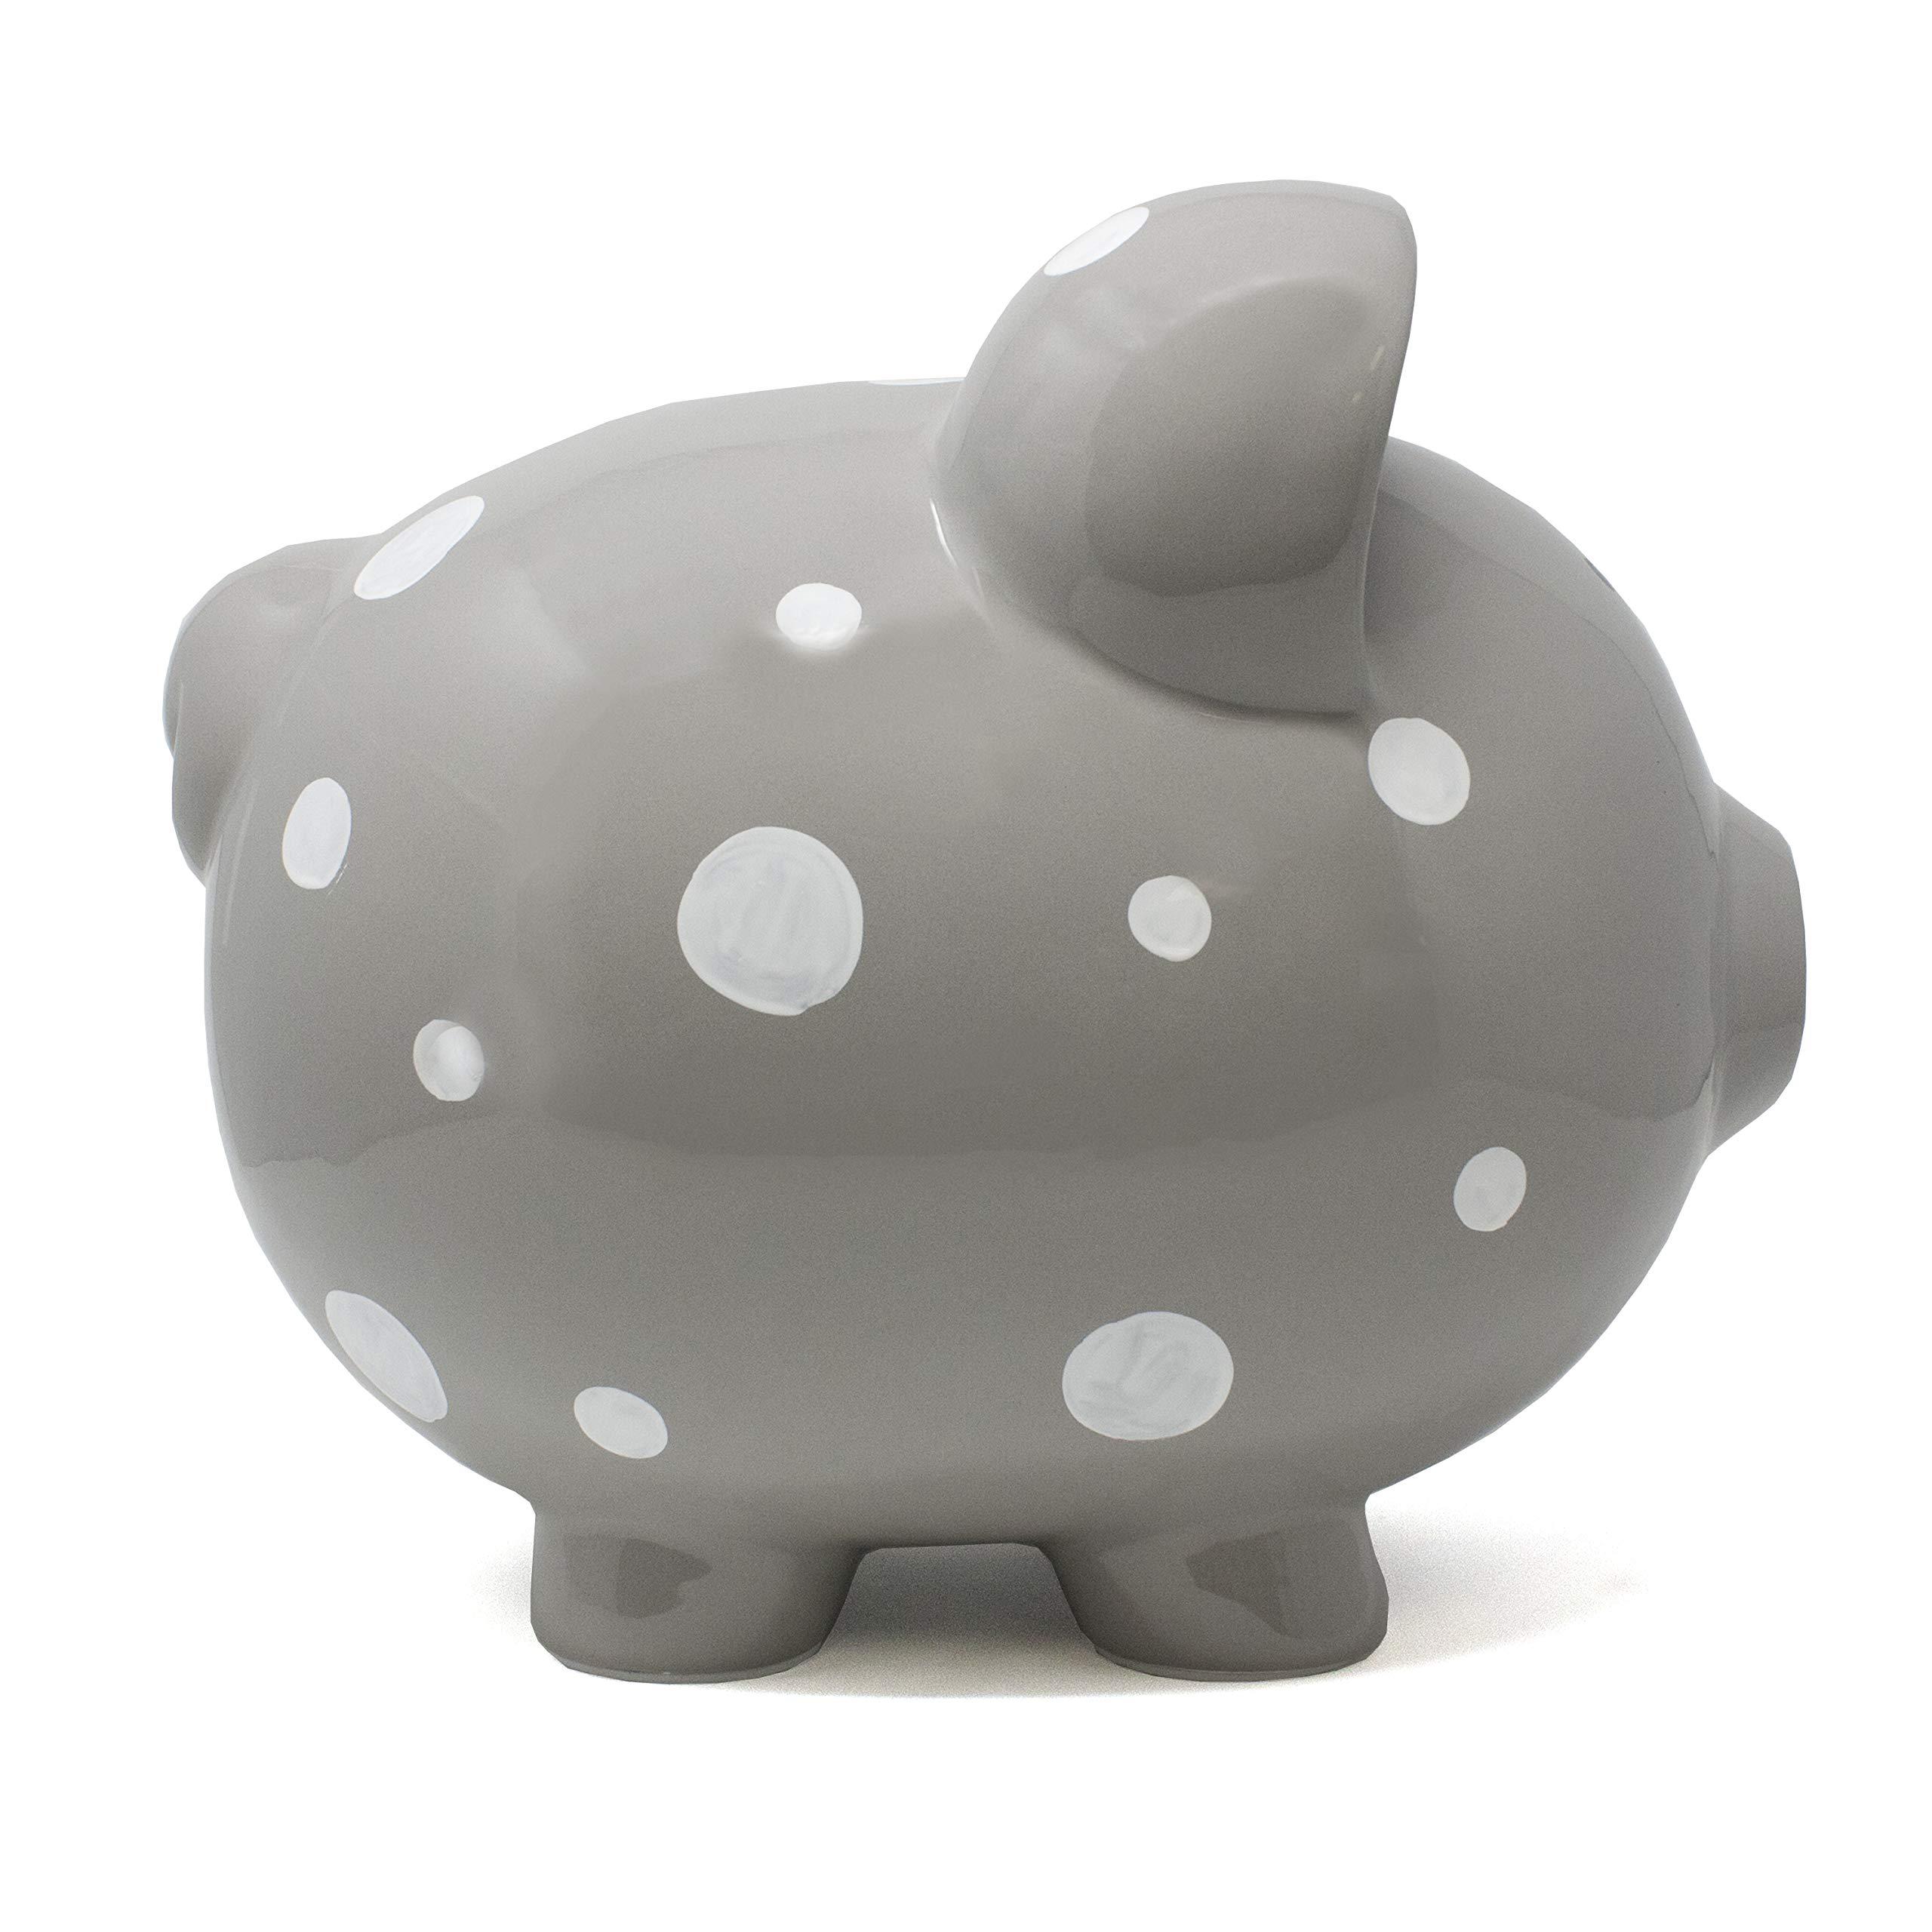 Child to Cherish Large Ceramic Boss Piggy Bank, Gray Polka Dot by Child to Cherish (Image #2)